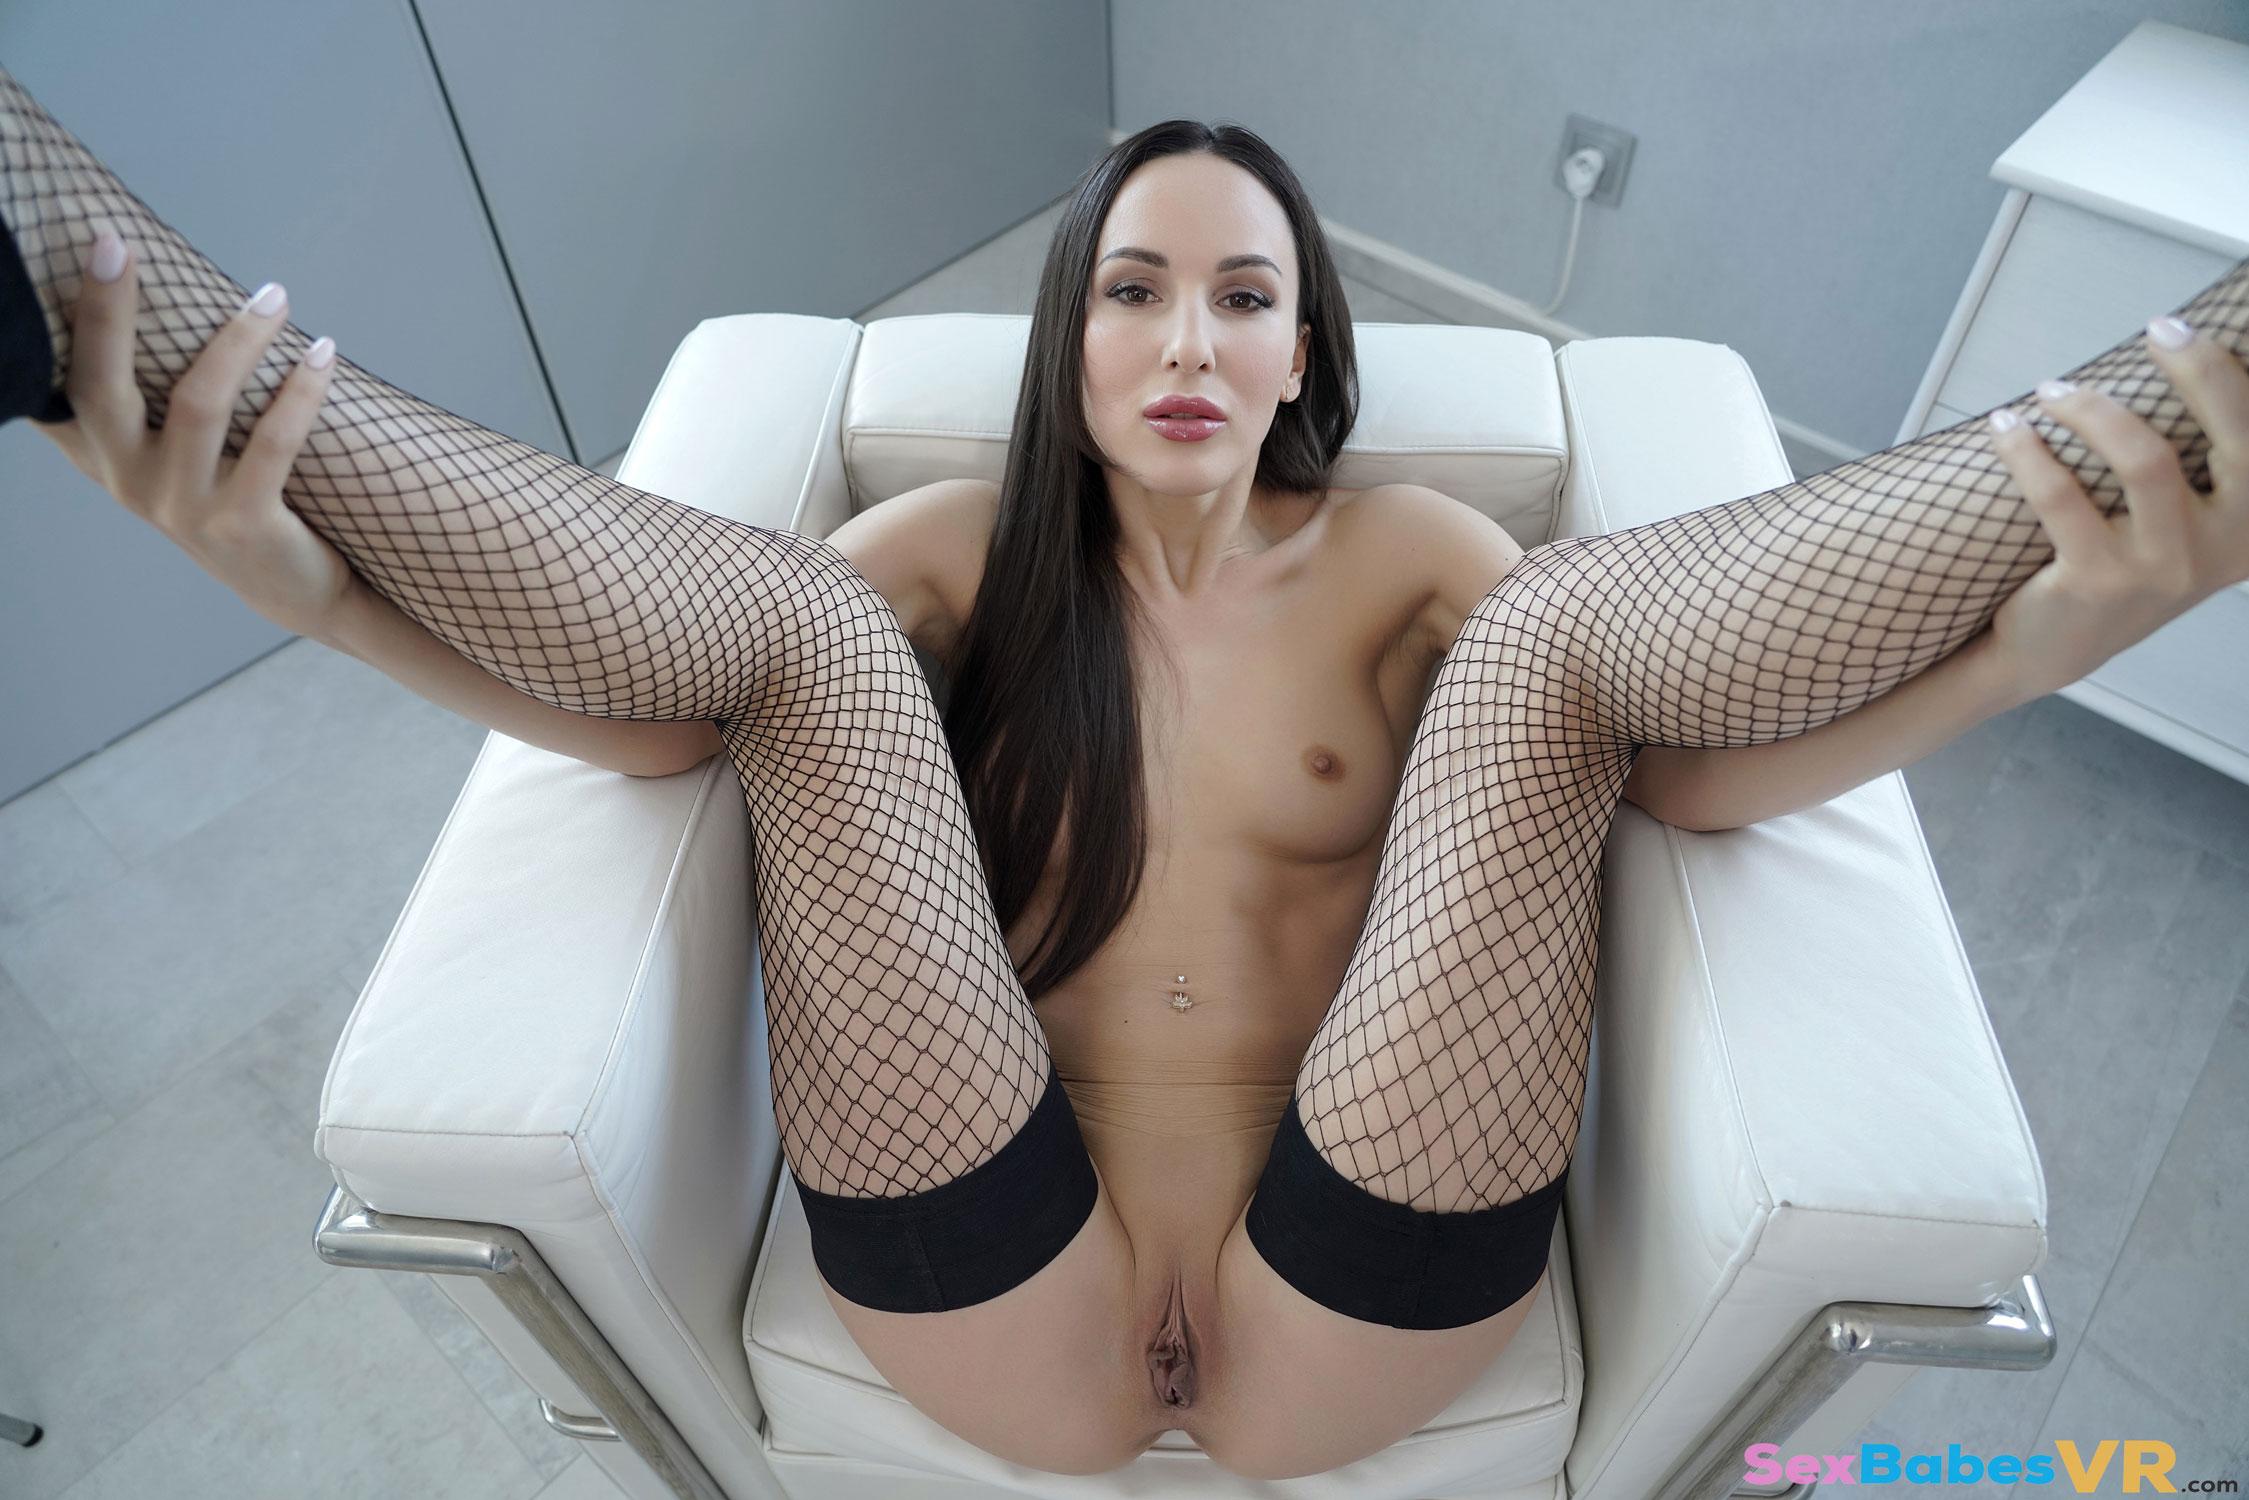 Porn star girl video